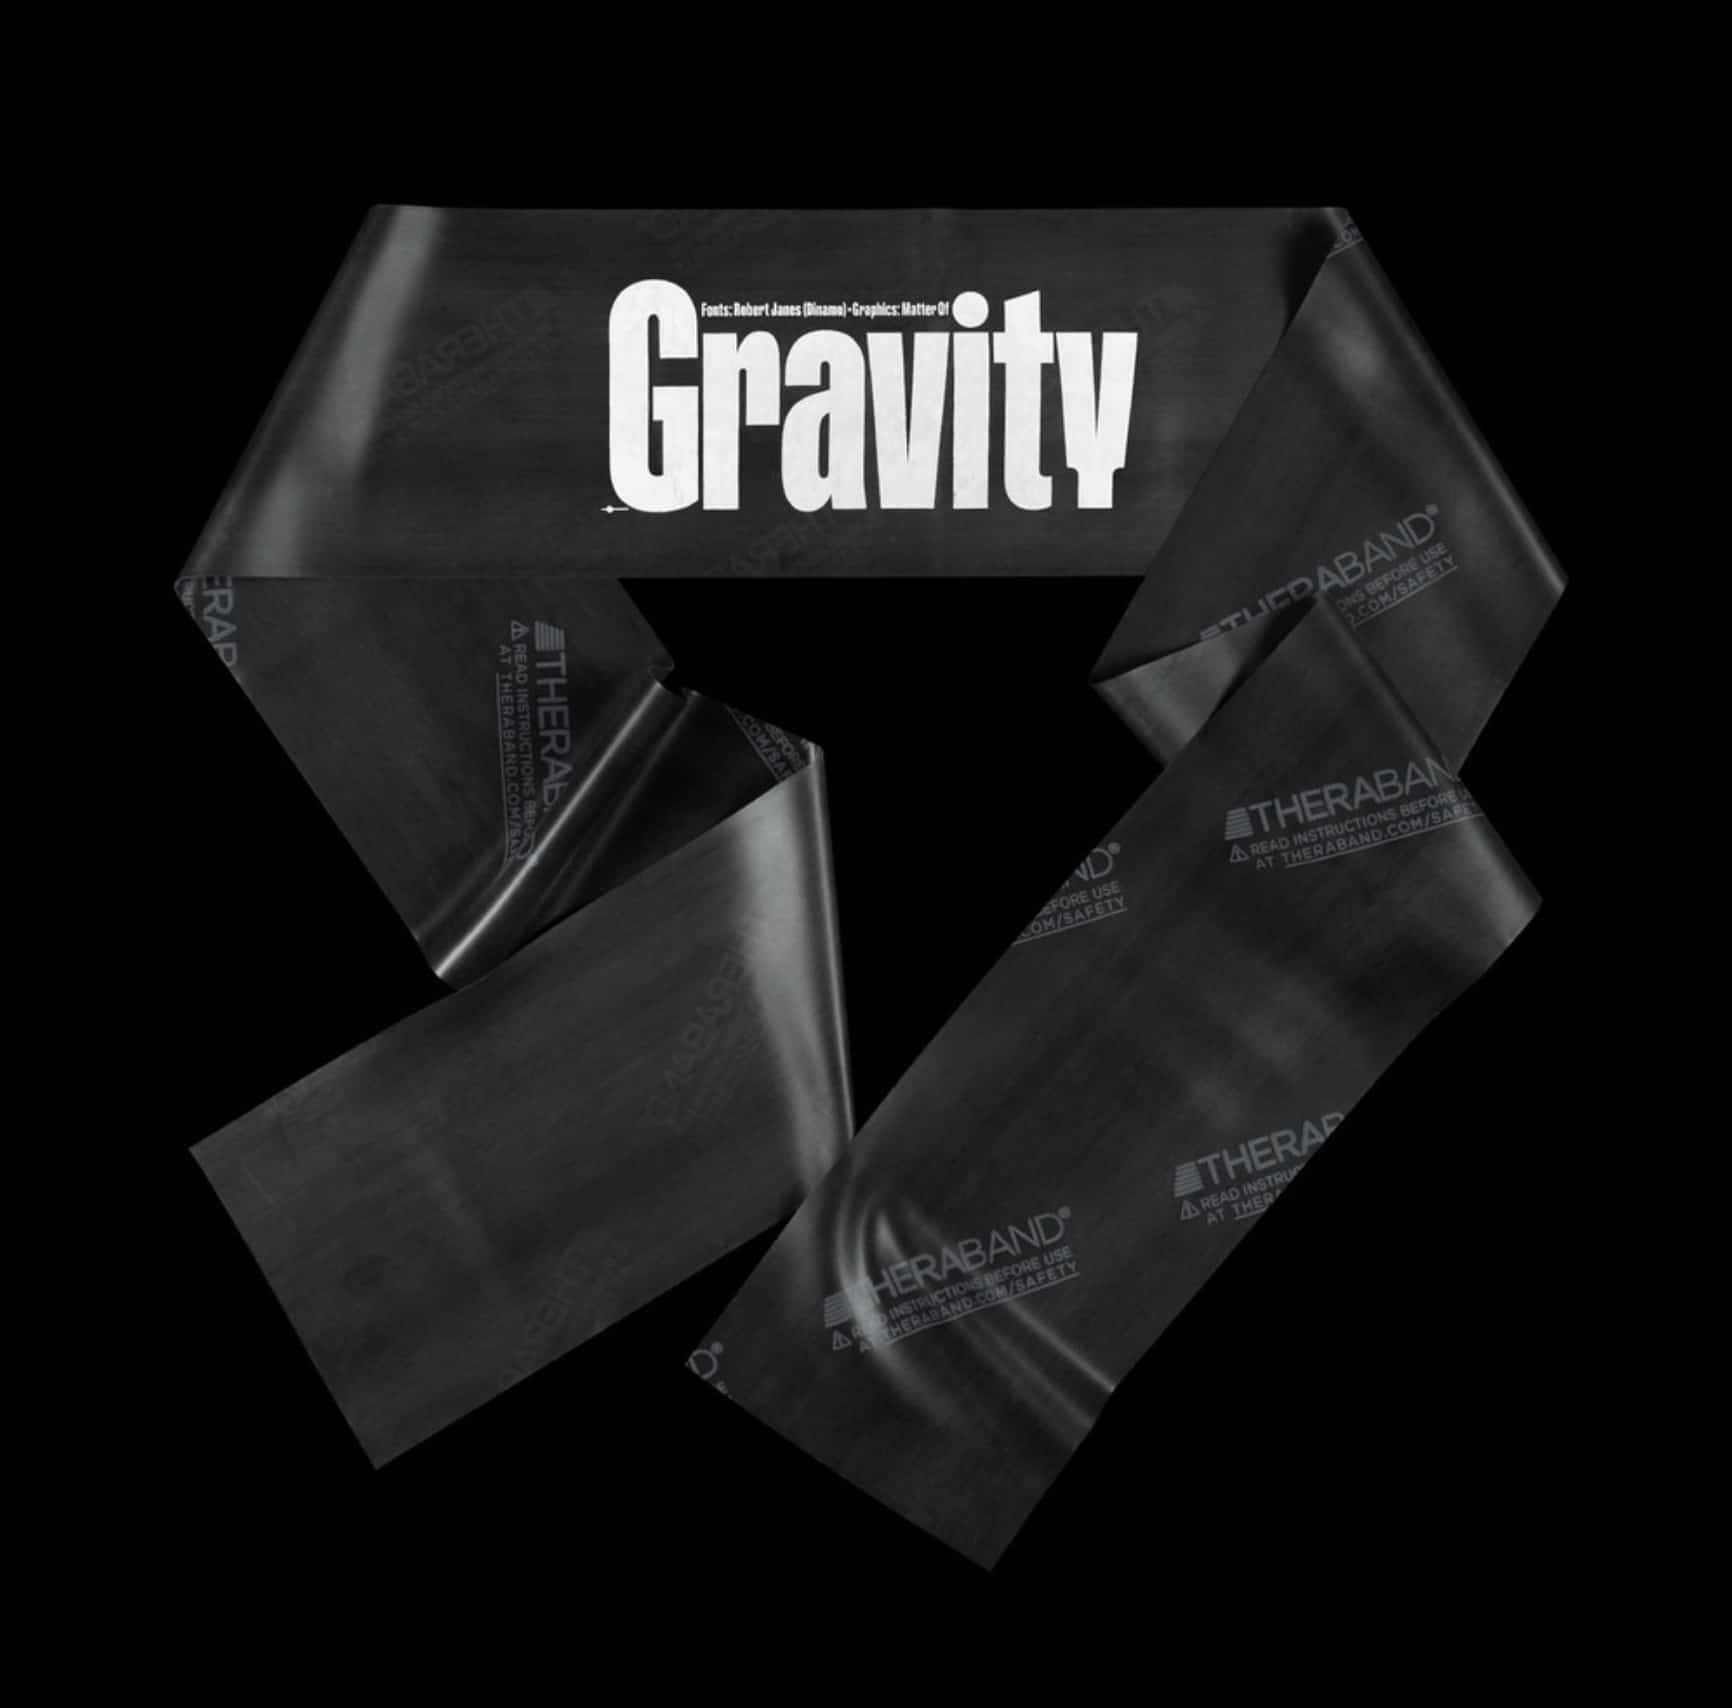 GravityTerraband